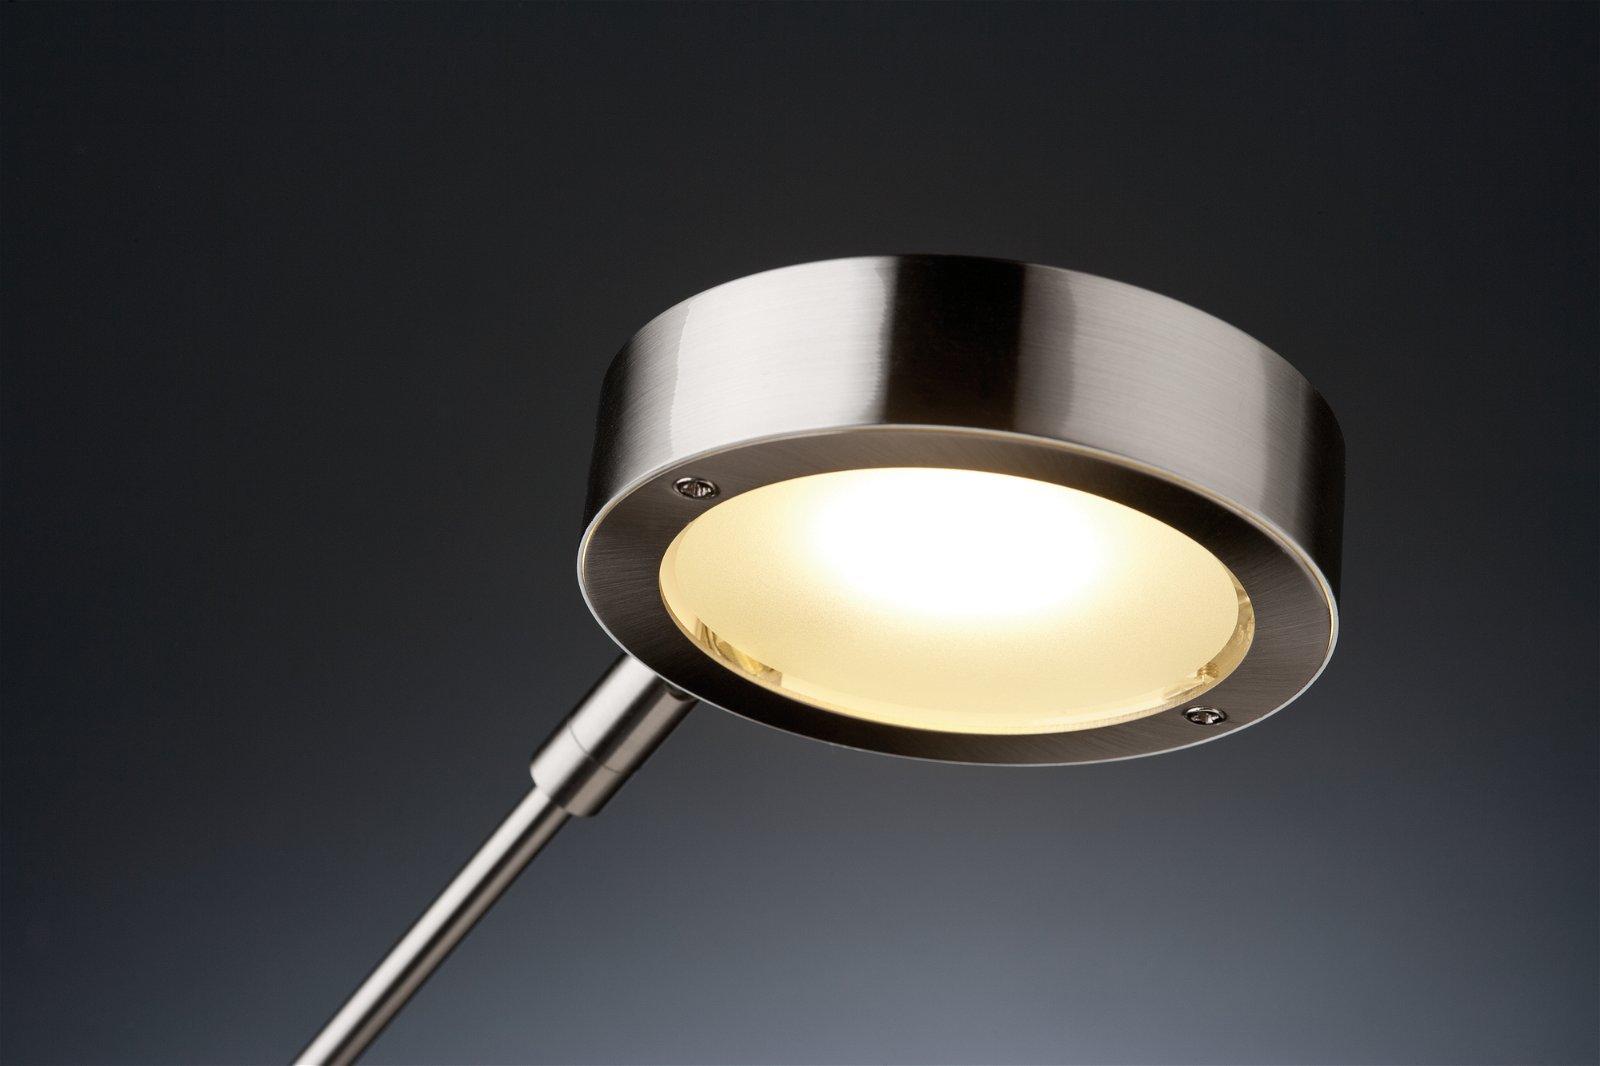 LED-bureaulamp Zed 3000K 359lm 6,7W Staal geborsteld